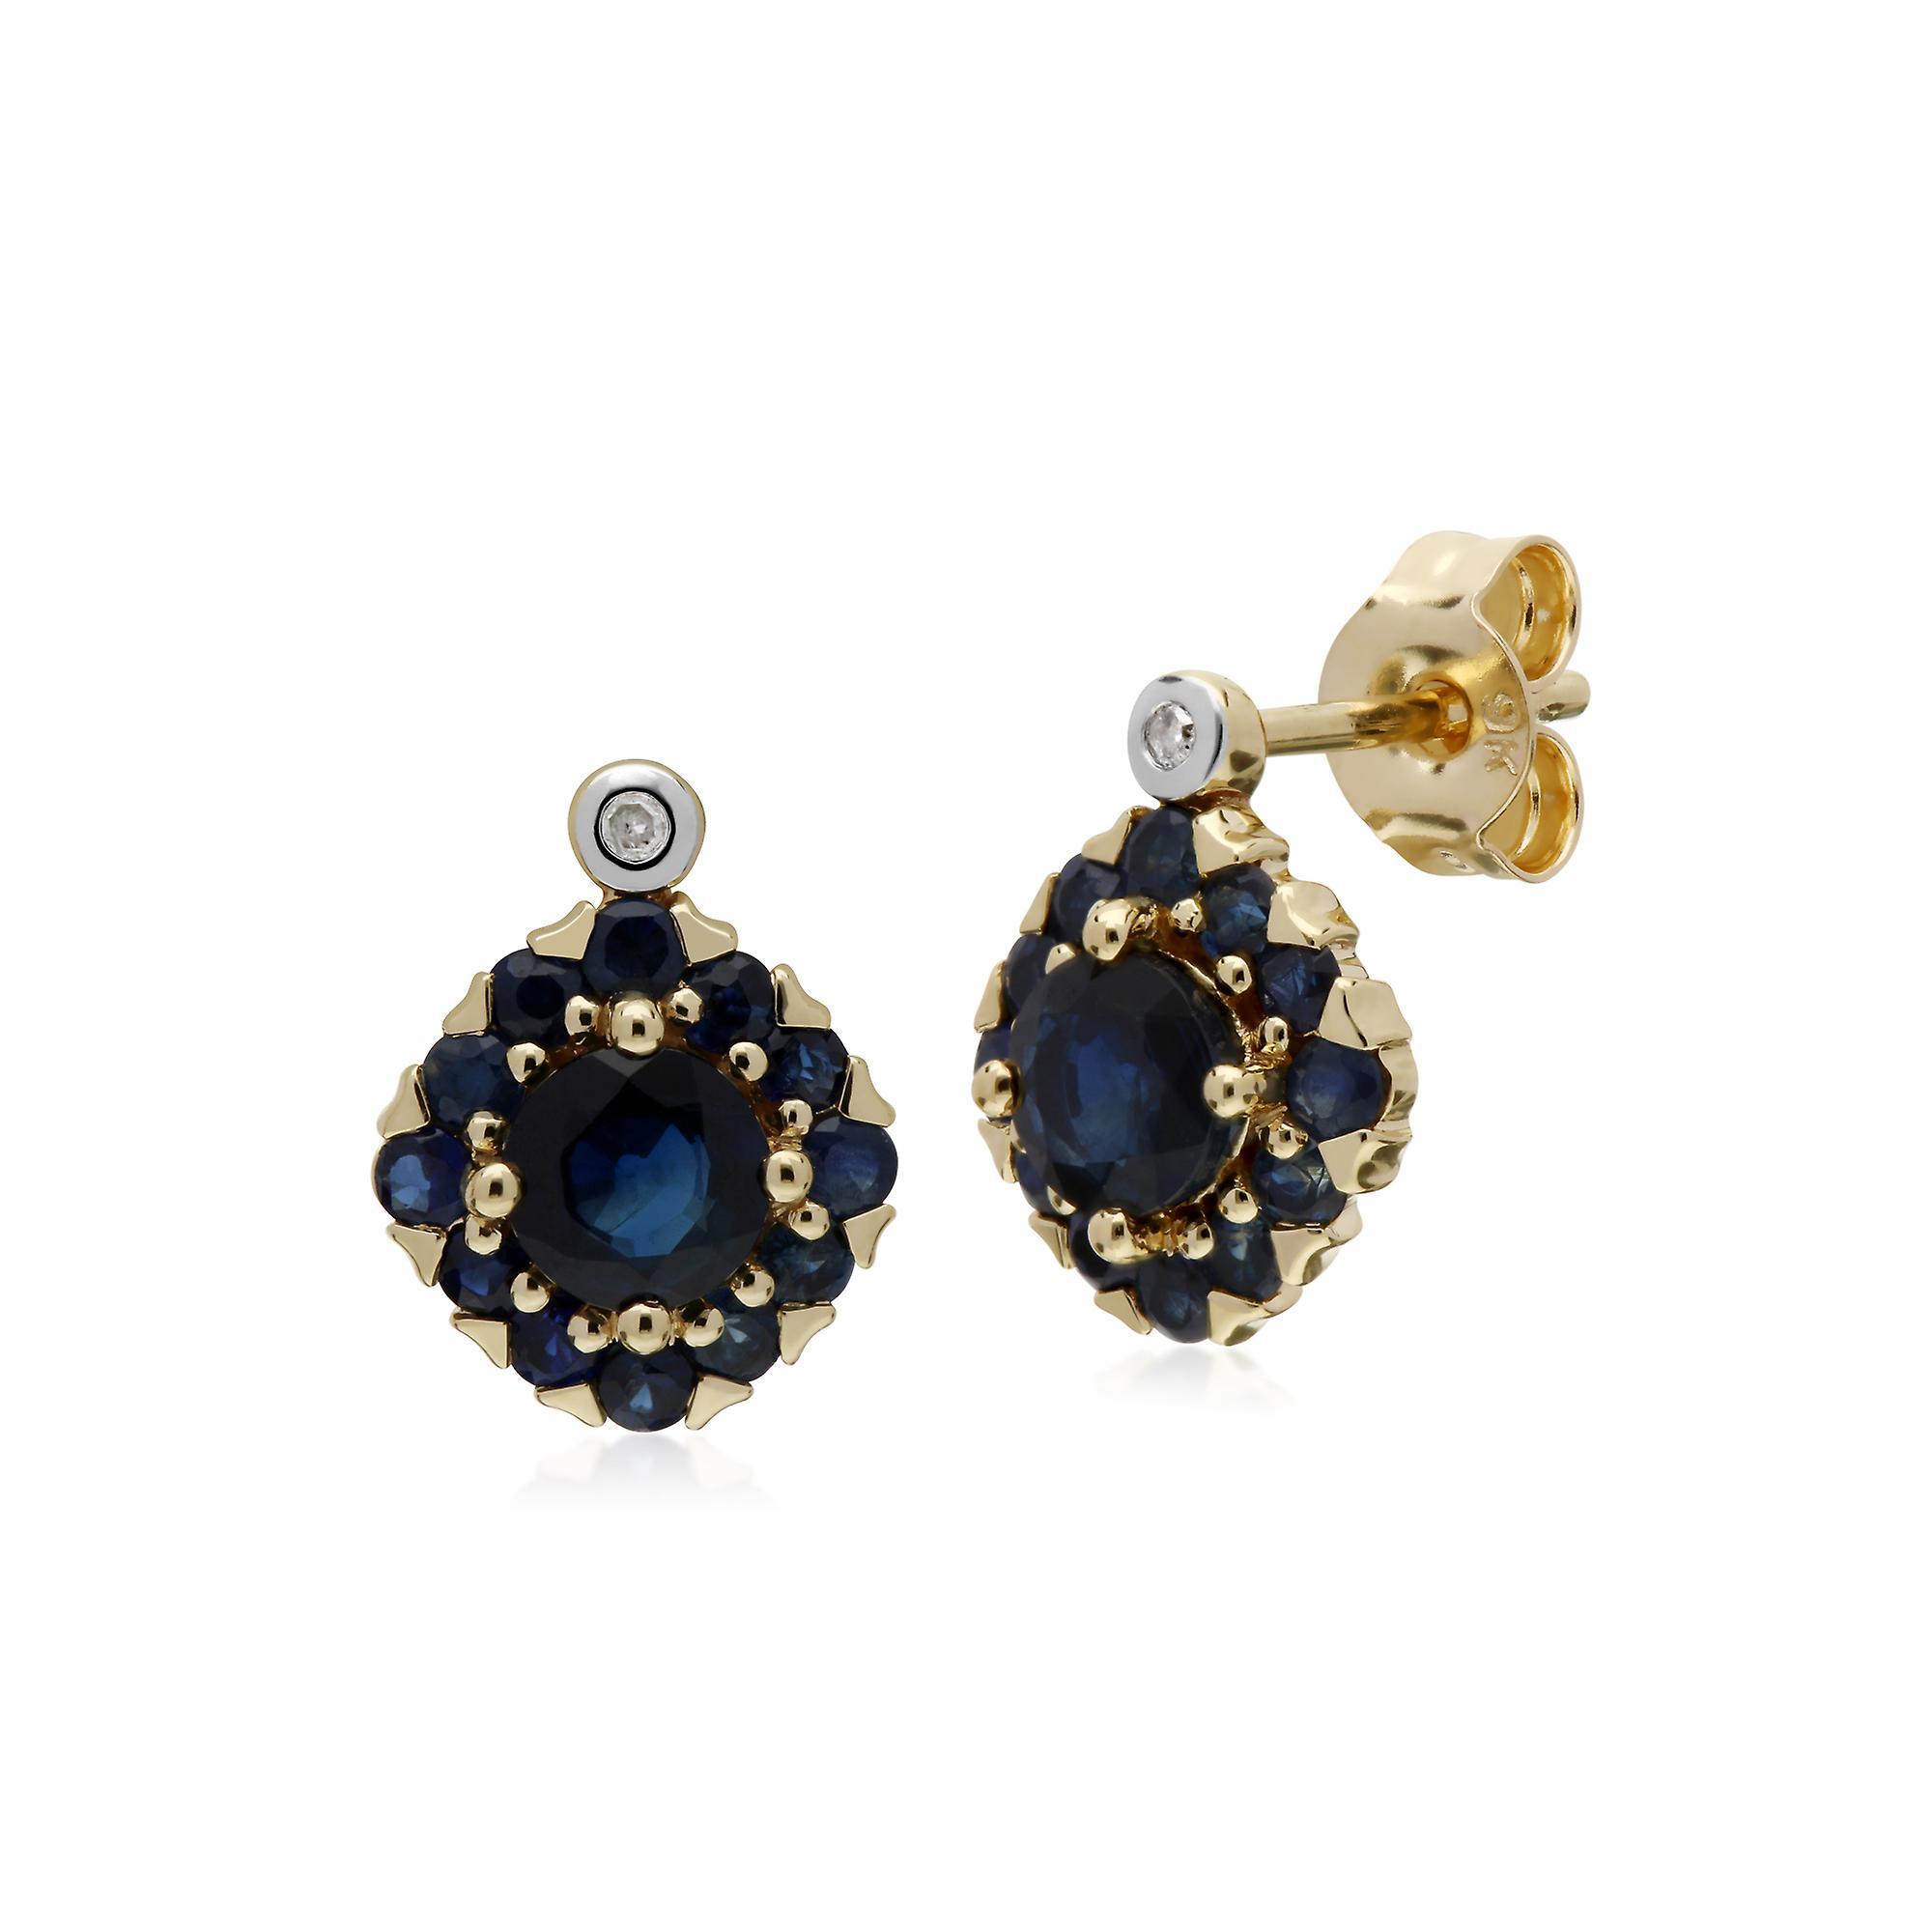 Gemondo 9ct jaune or Sapphire & Diamond Square Cluster Stud boucles d'oreilles